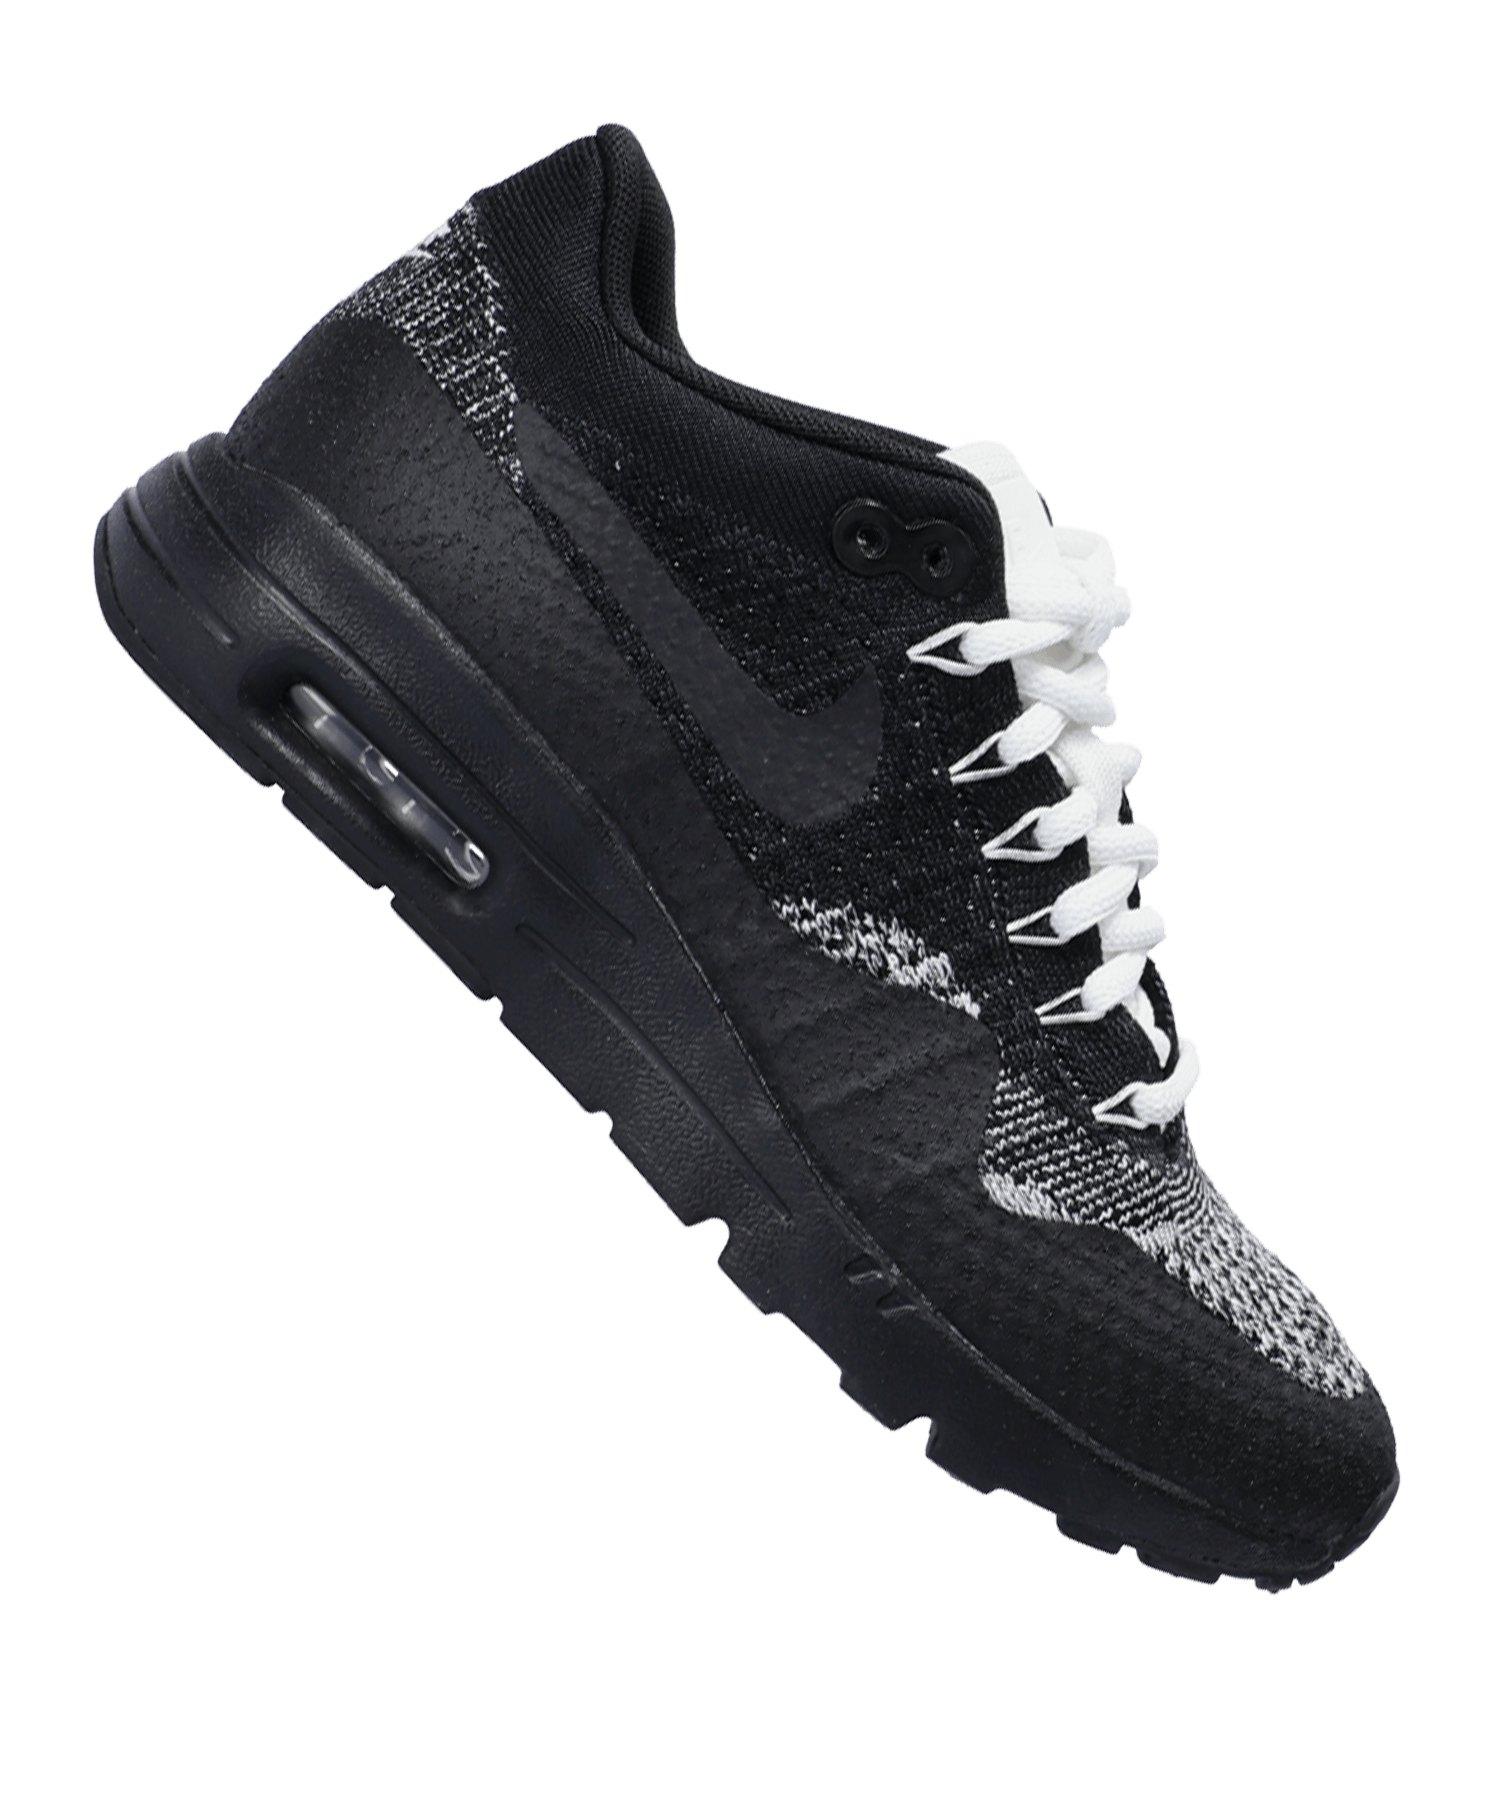 Nike Mens Air Max 90 Ultra Mid Winter